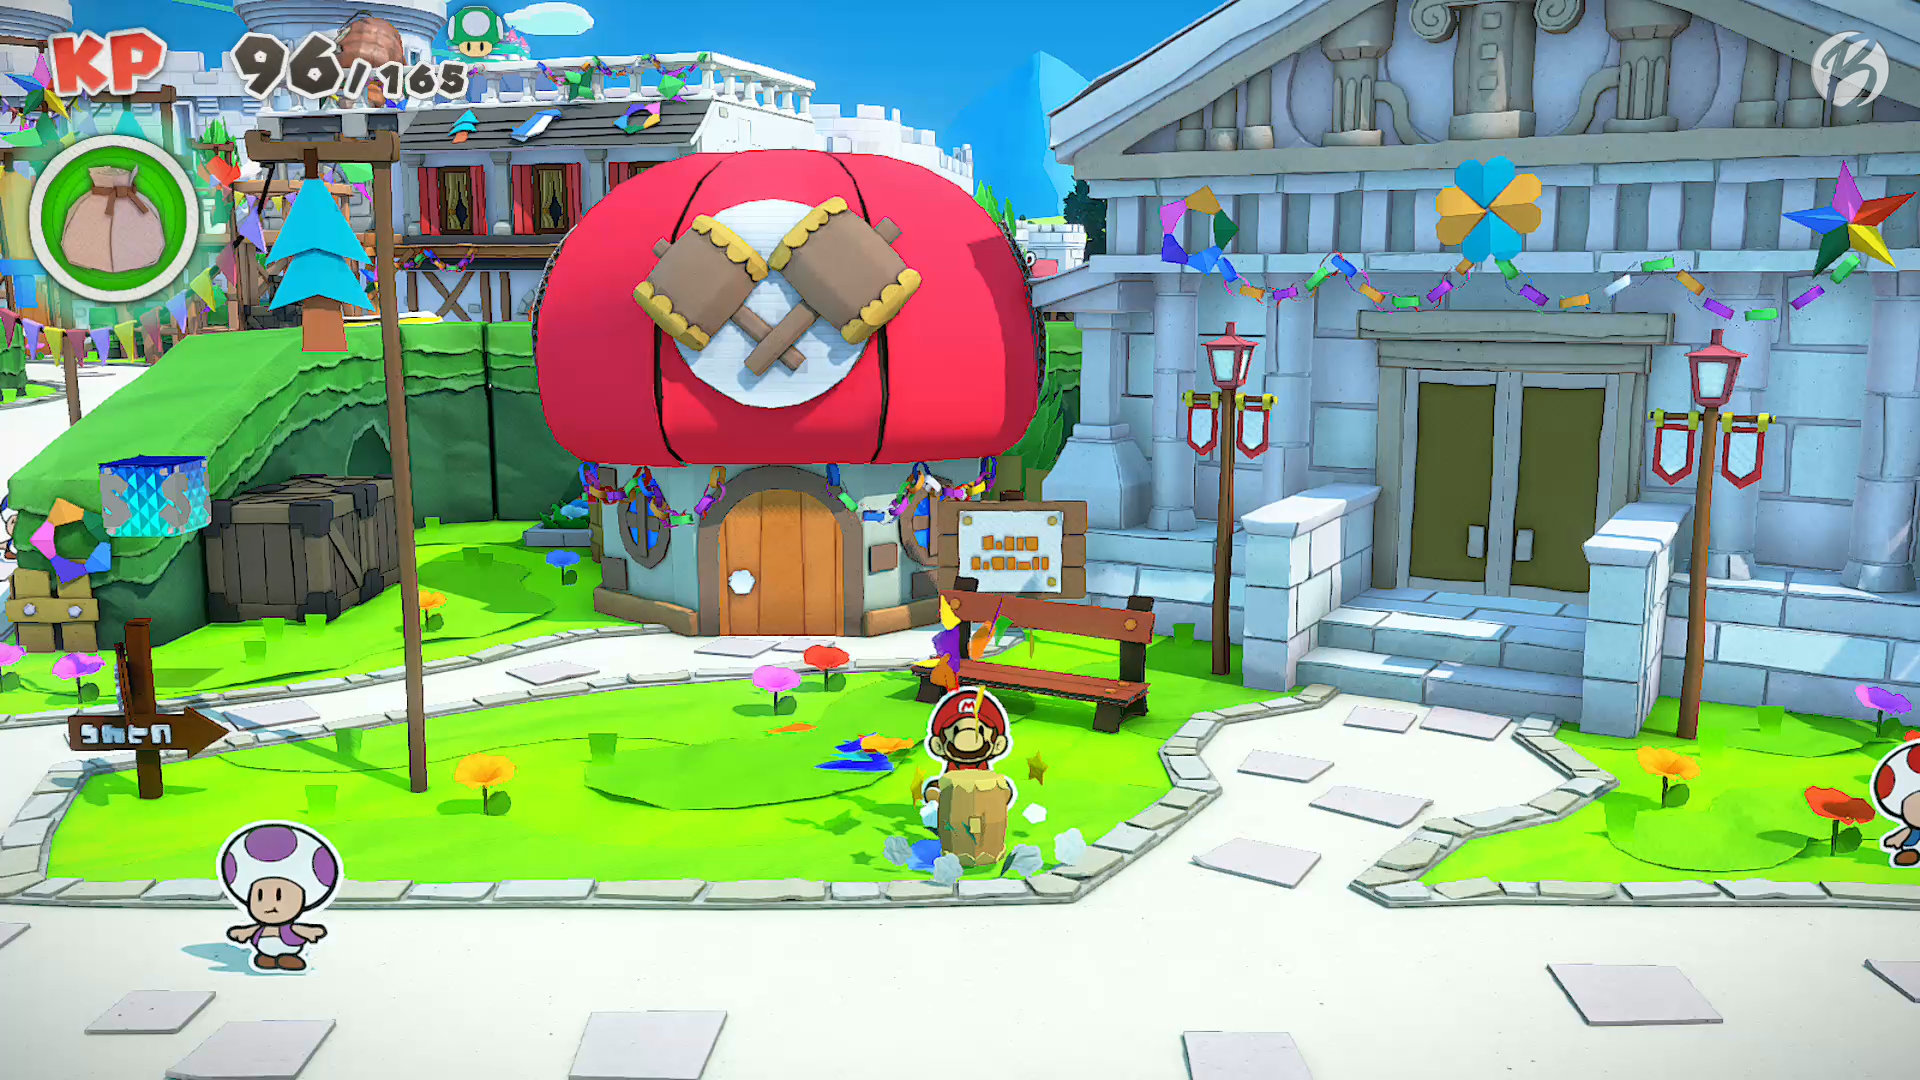 Paper Mario: The Origami King - Toad Town ist wunderschön gestaltet.